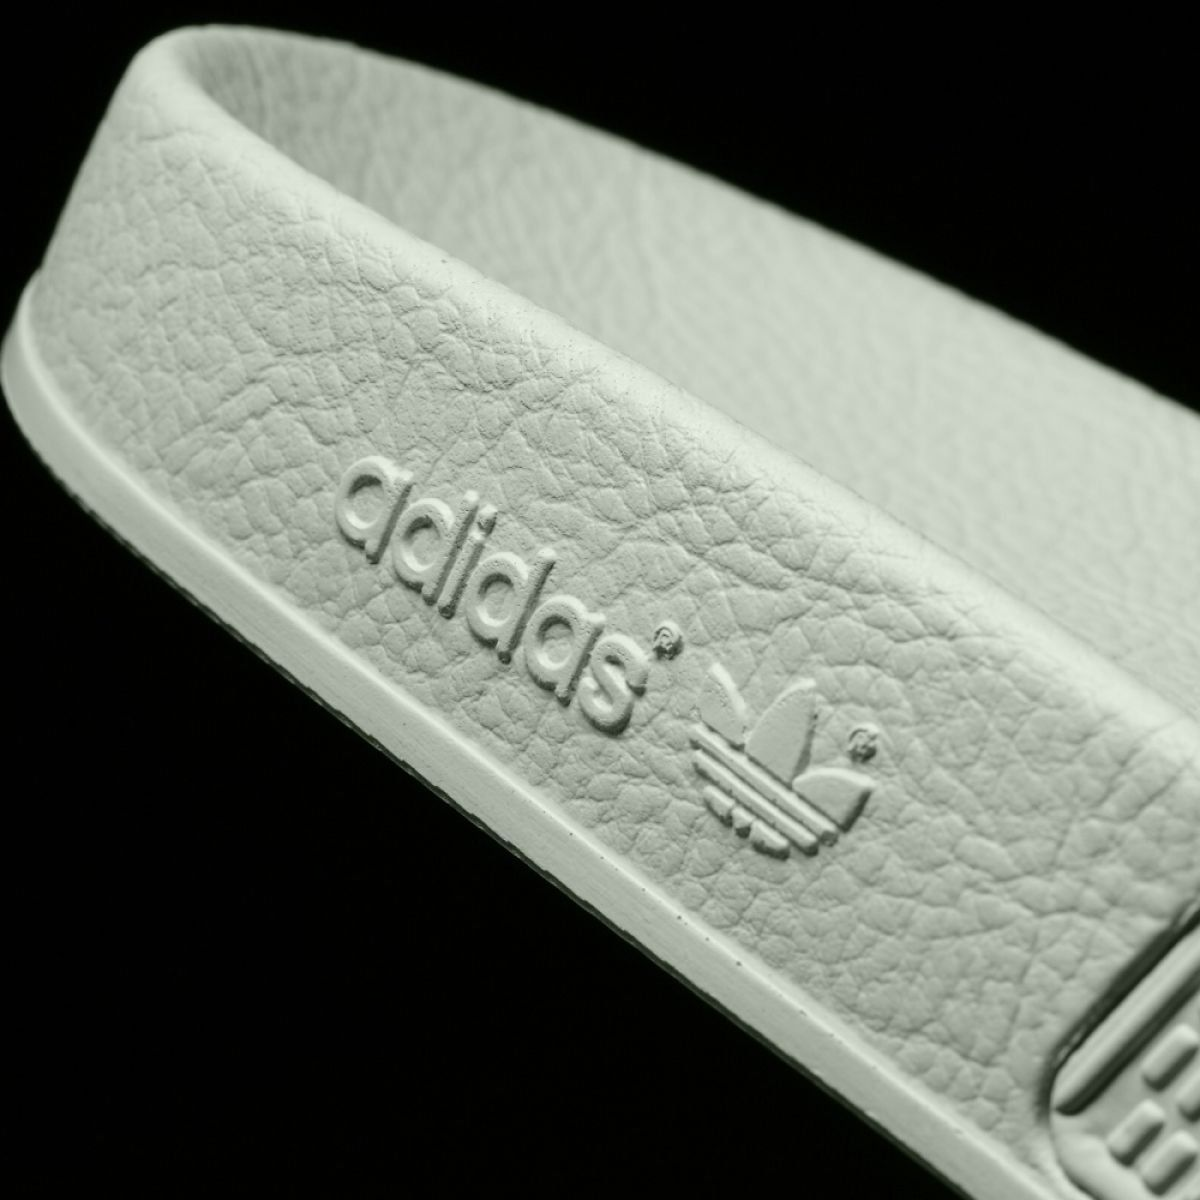 Klapki Adidas Originals Adillette W Ba7540 Biale Adidas Shoes Women Adidas Originals Adidas